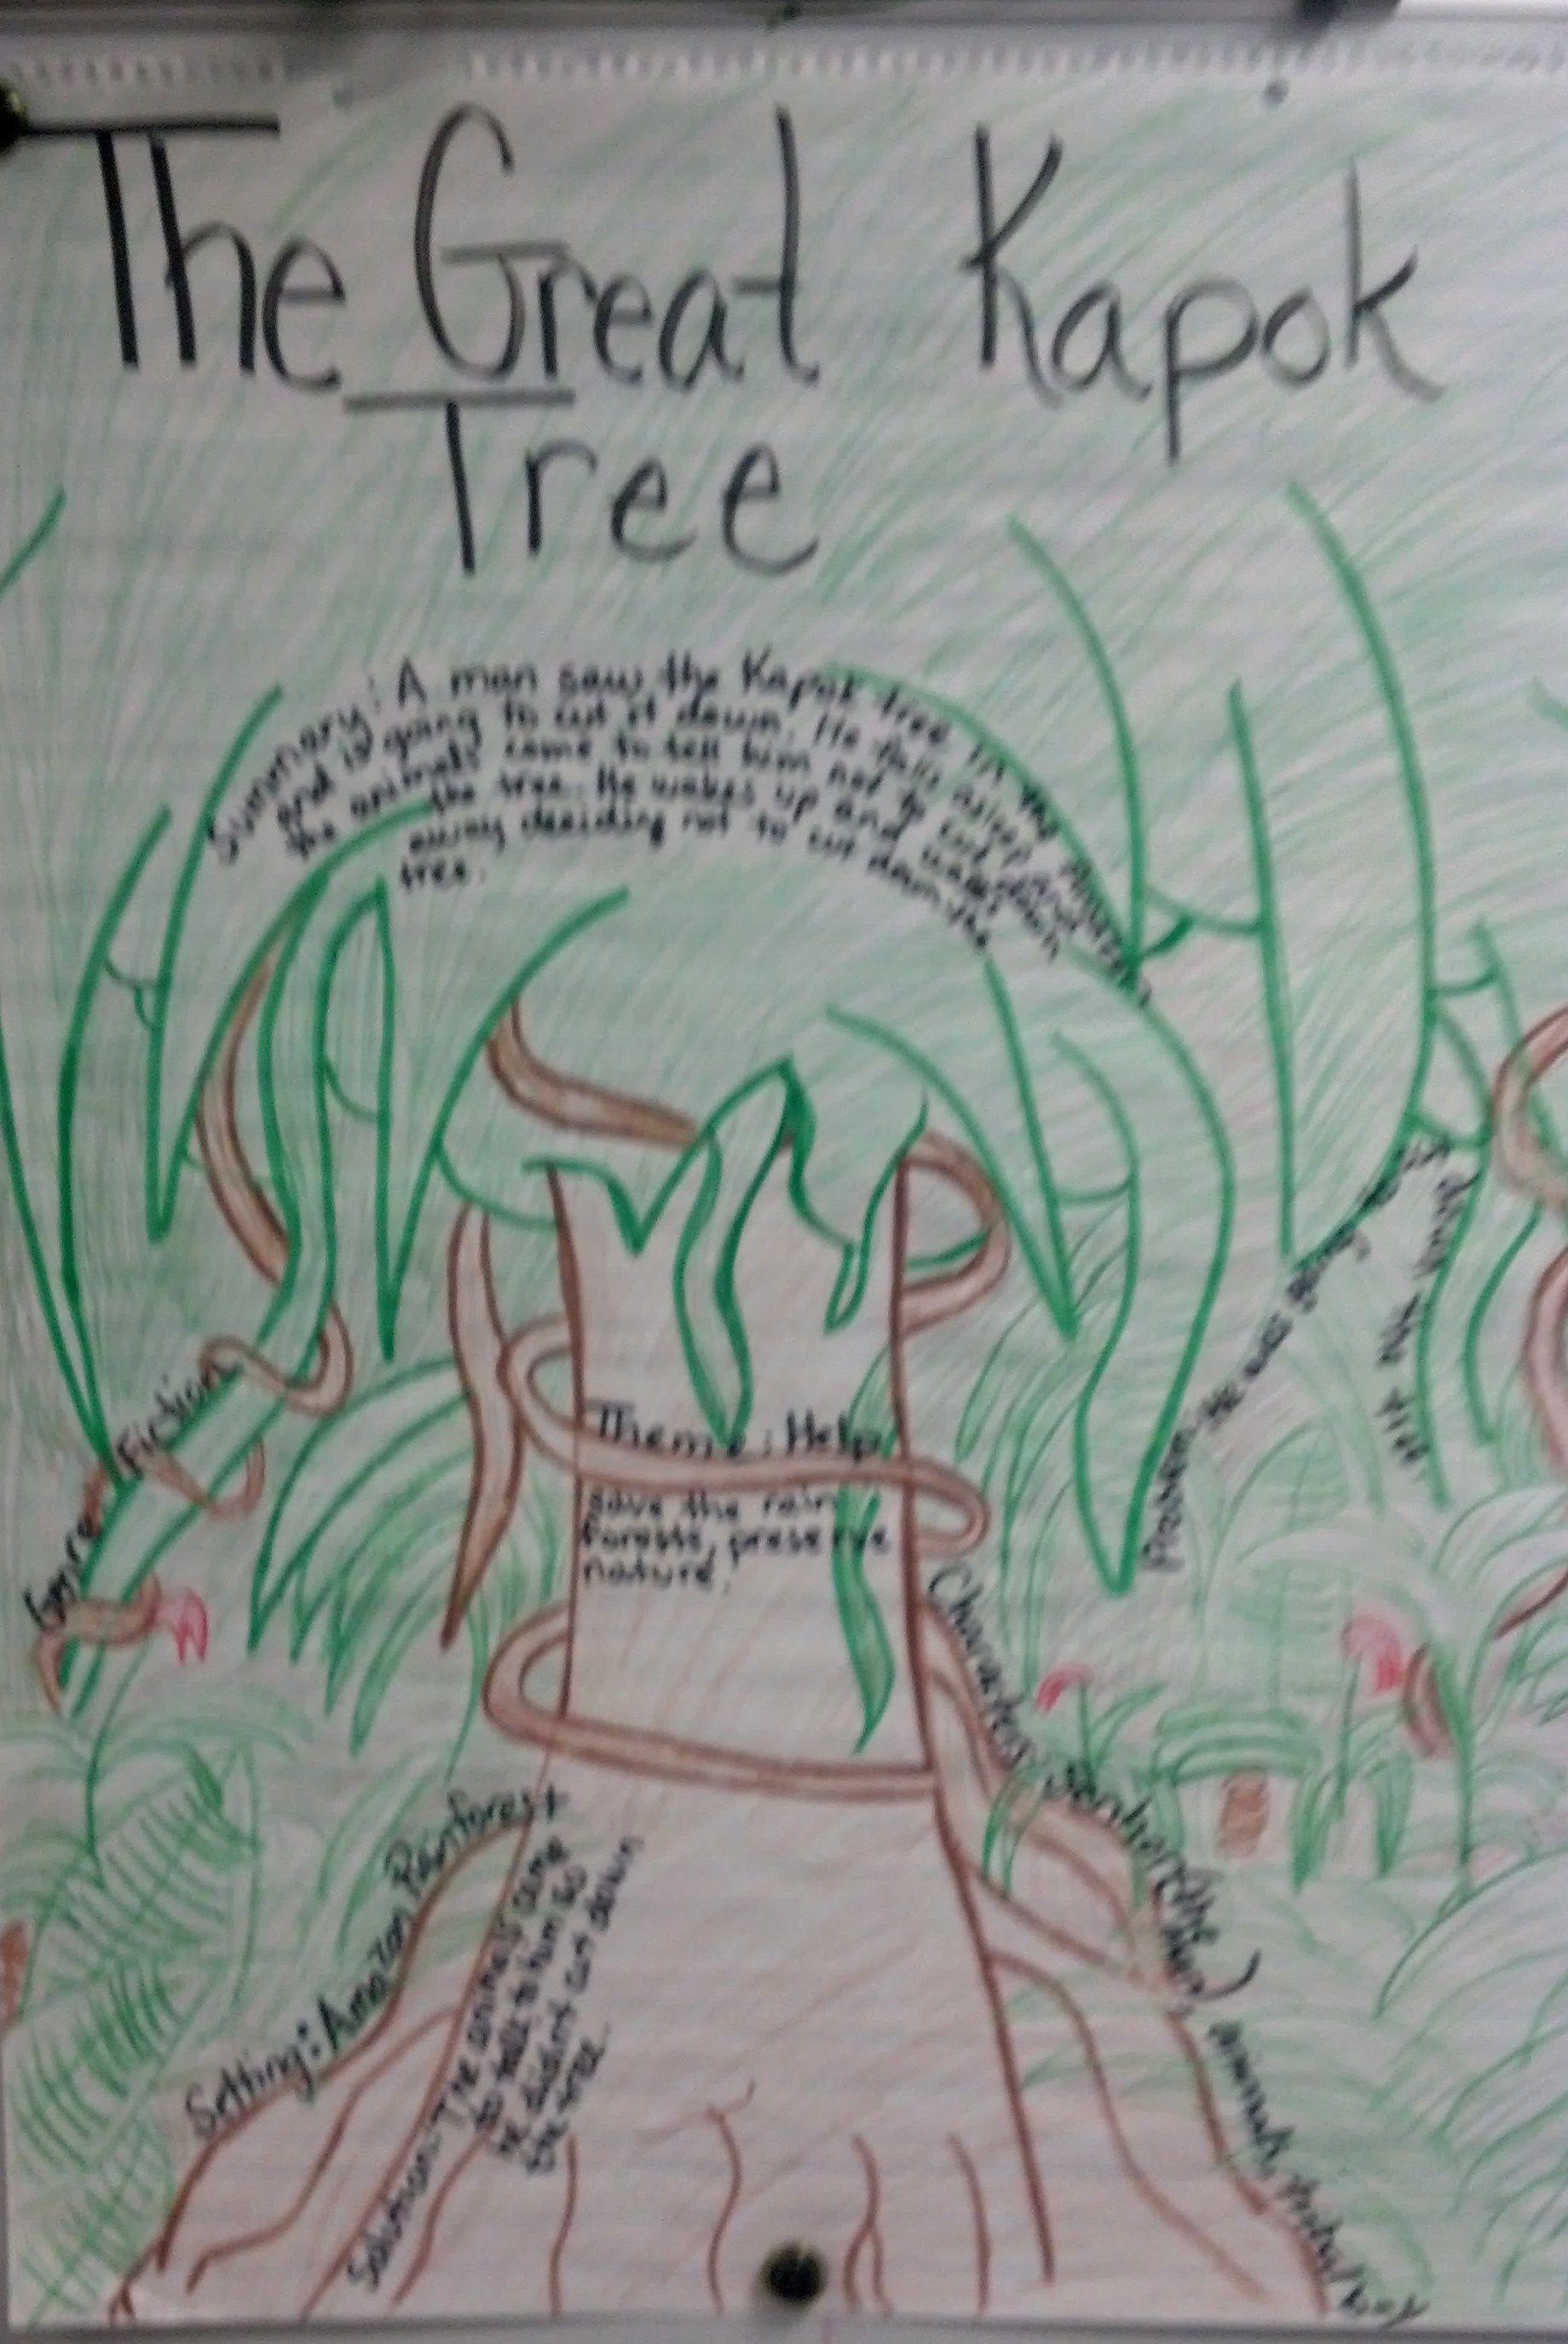 The Great Kapok Tree Story Elements